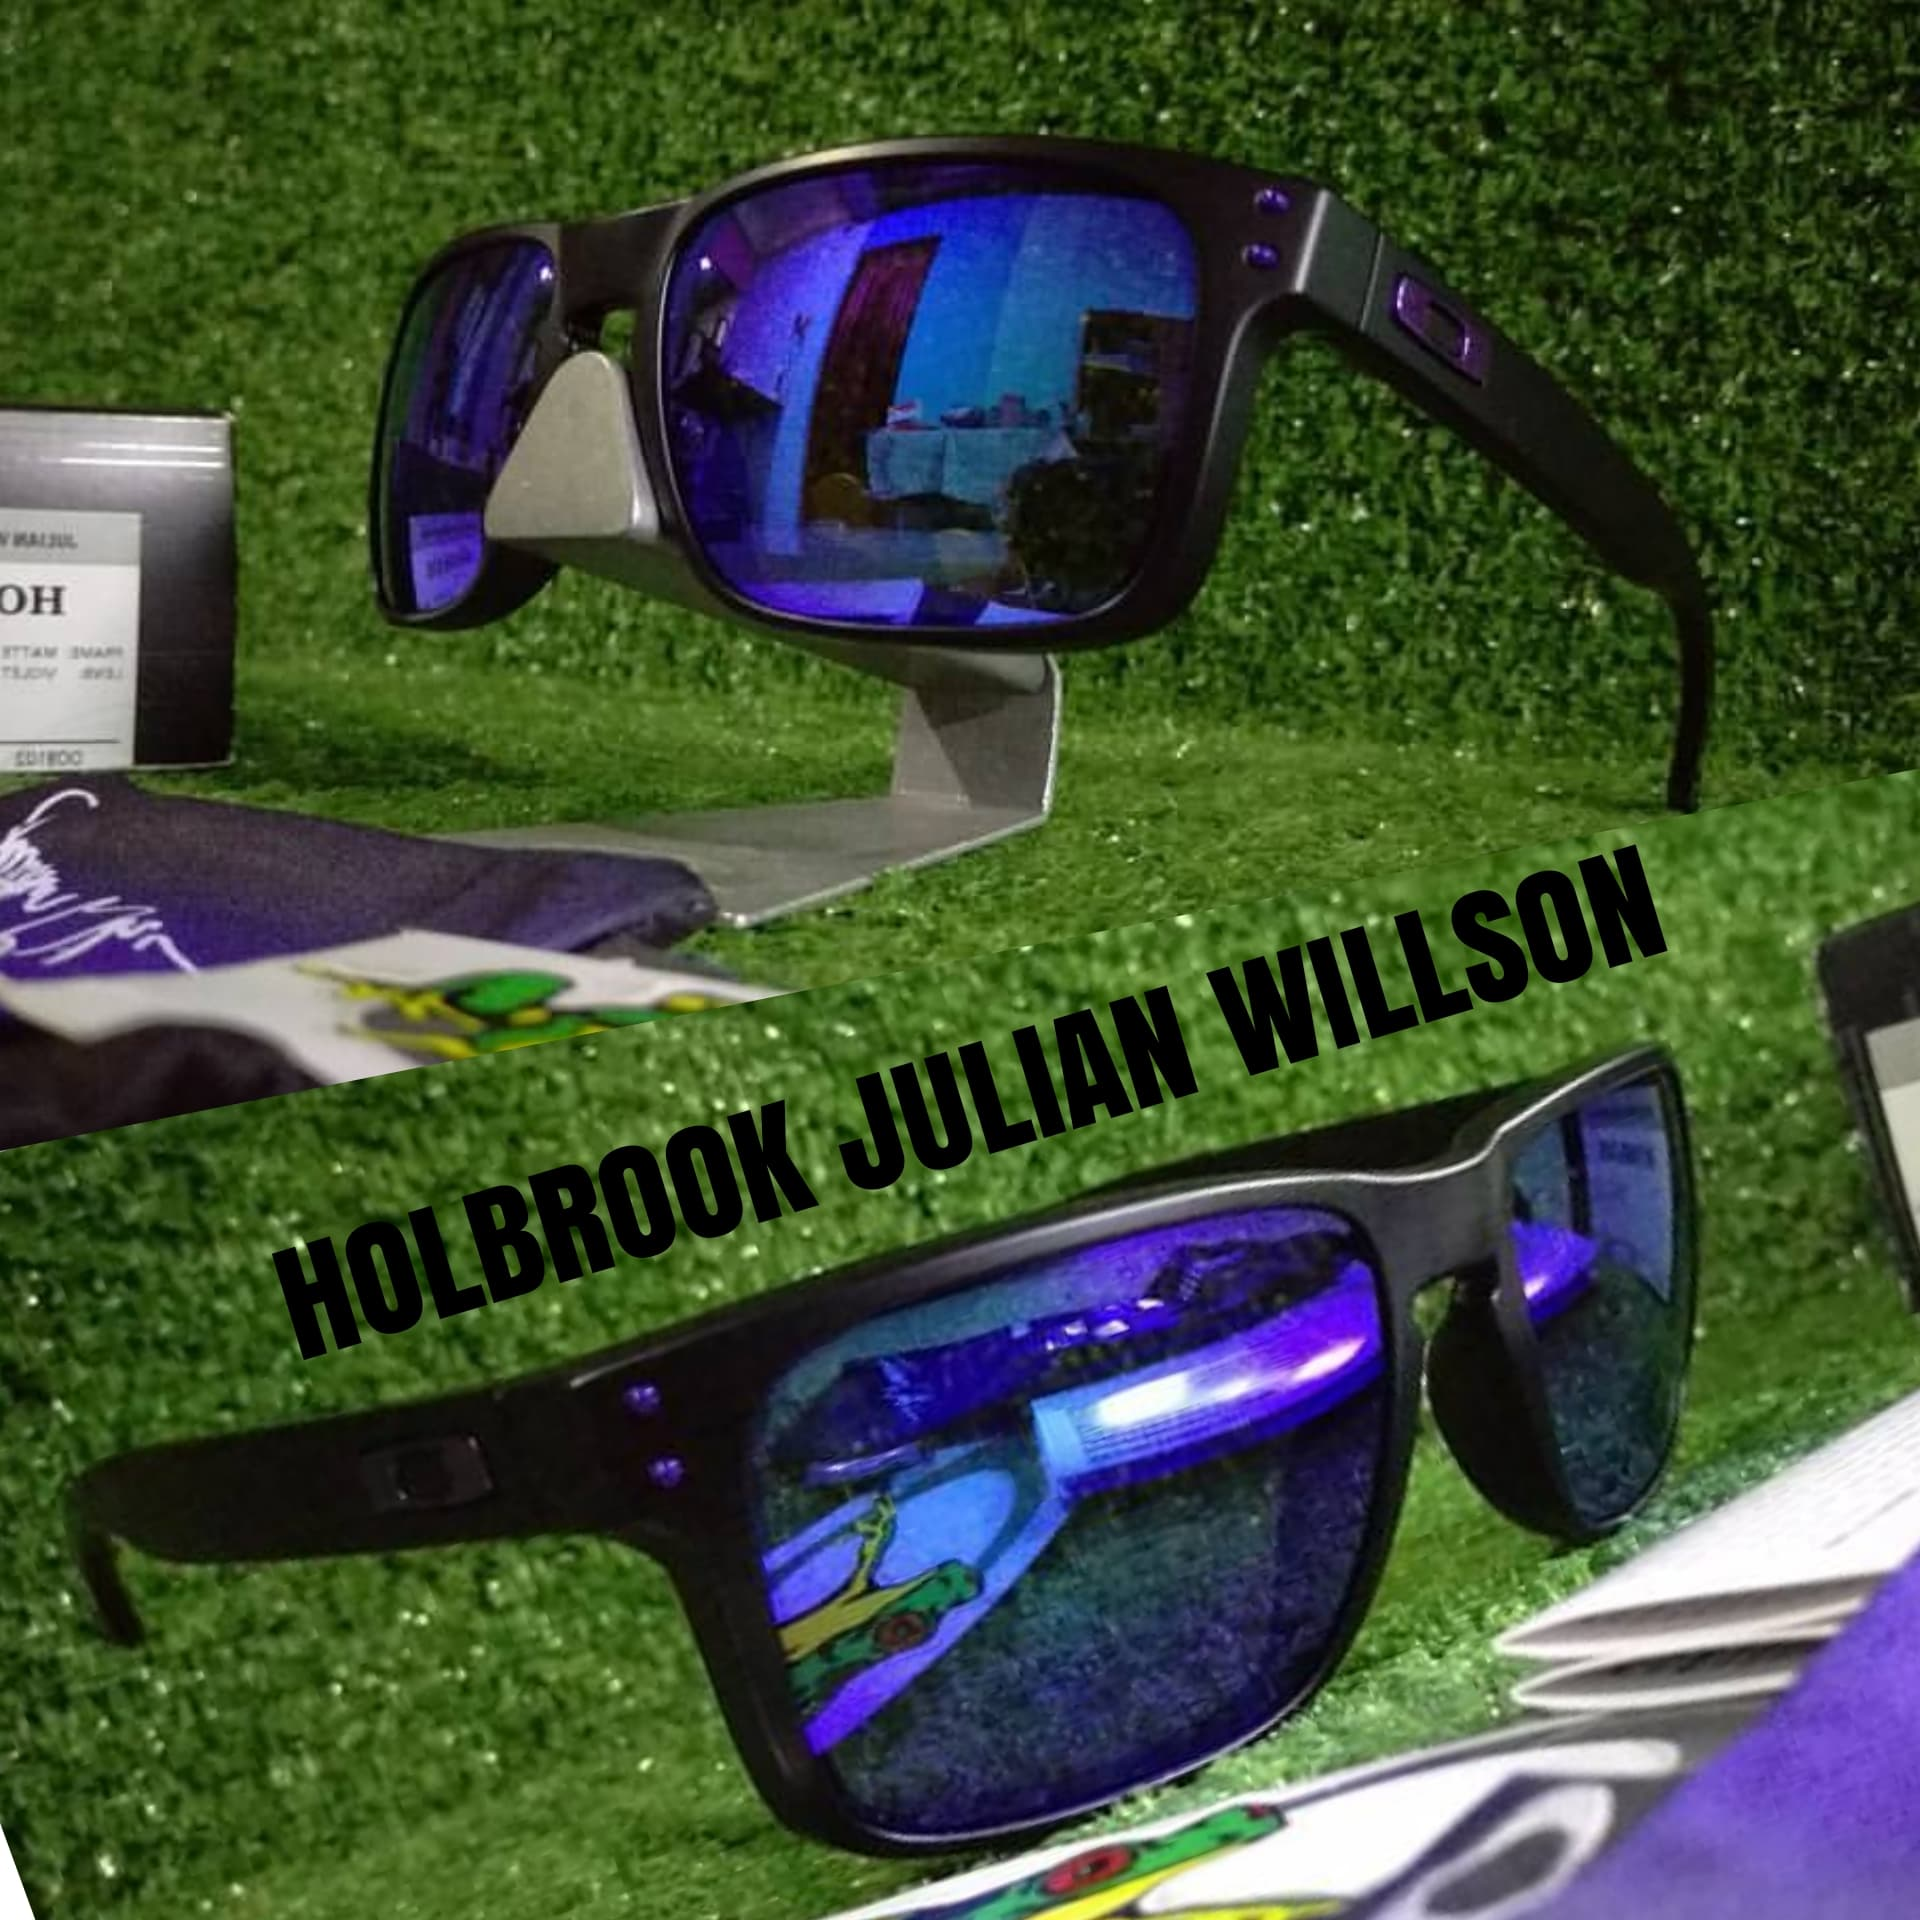 ... Kacamata Oakley Holbrook Vr46 Rossi Lensa Polarized Super Premium -  Gambar Ke Dua - Nita - 2ac16bb6e8